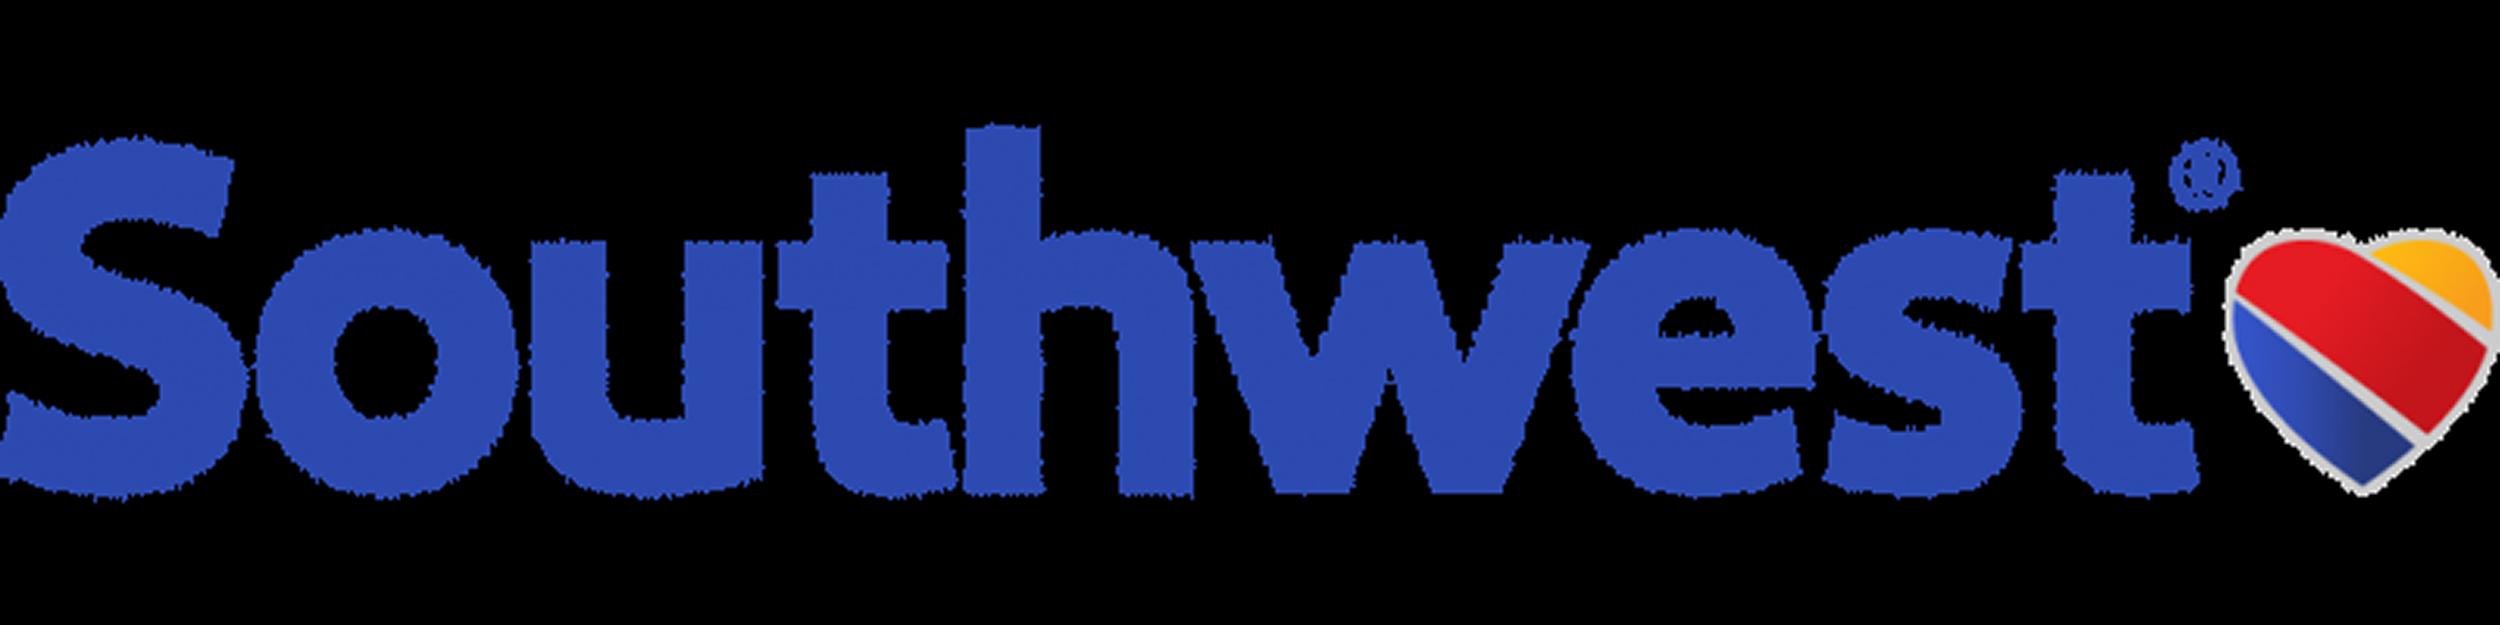 Southwest Logo copy